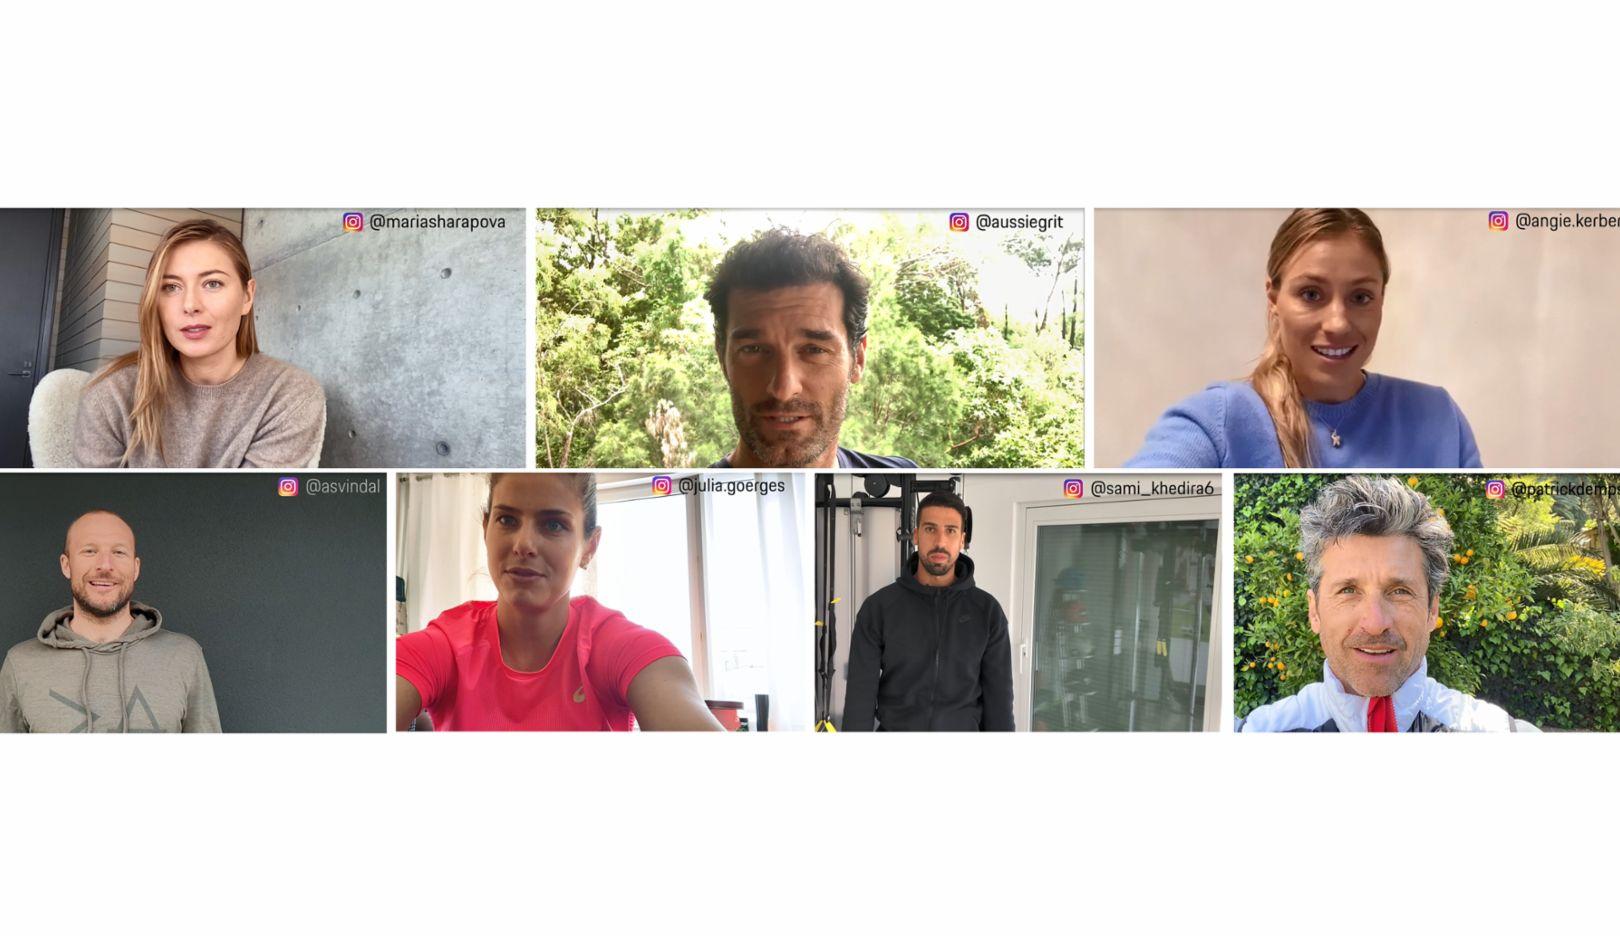 Brand ambassadors show their spirit of togetherness - Image 2